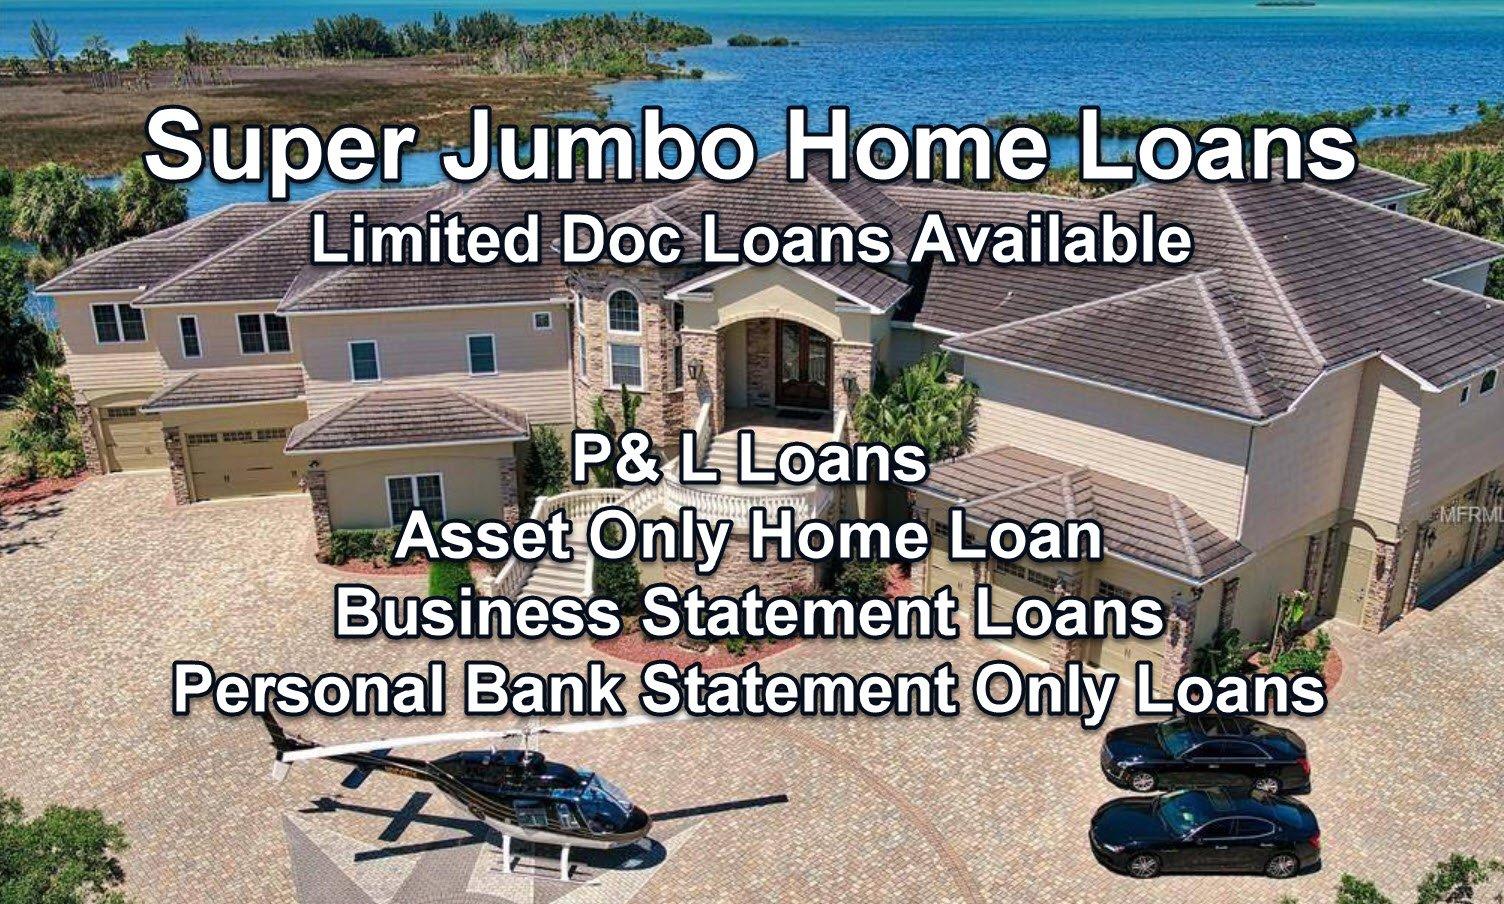 Jumbo and Super Jumbo Home Loans